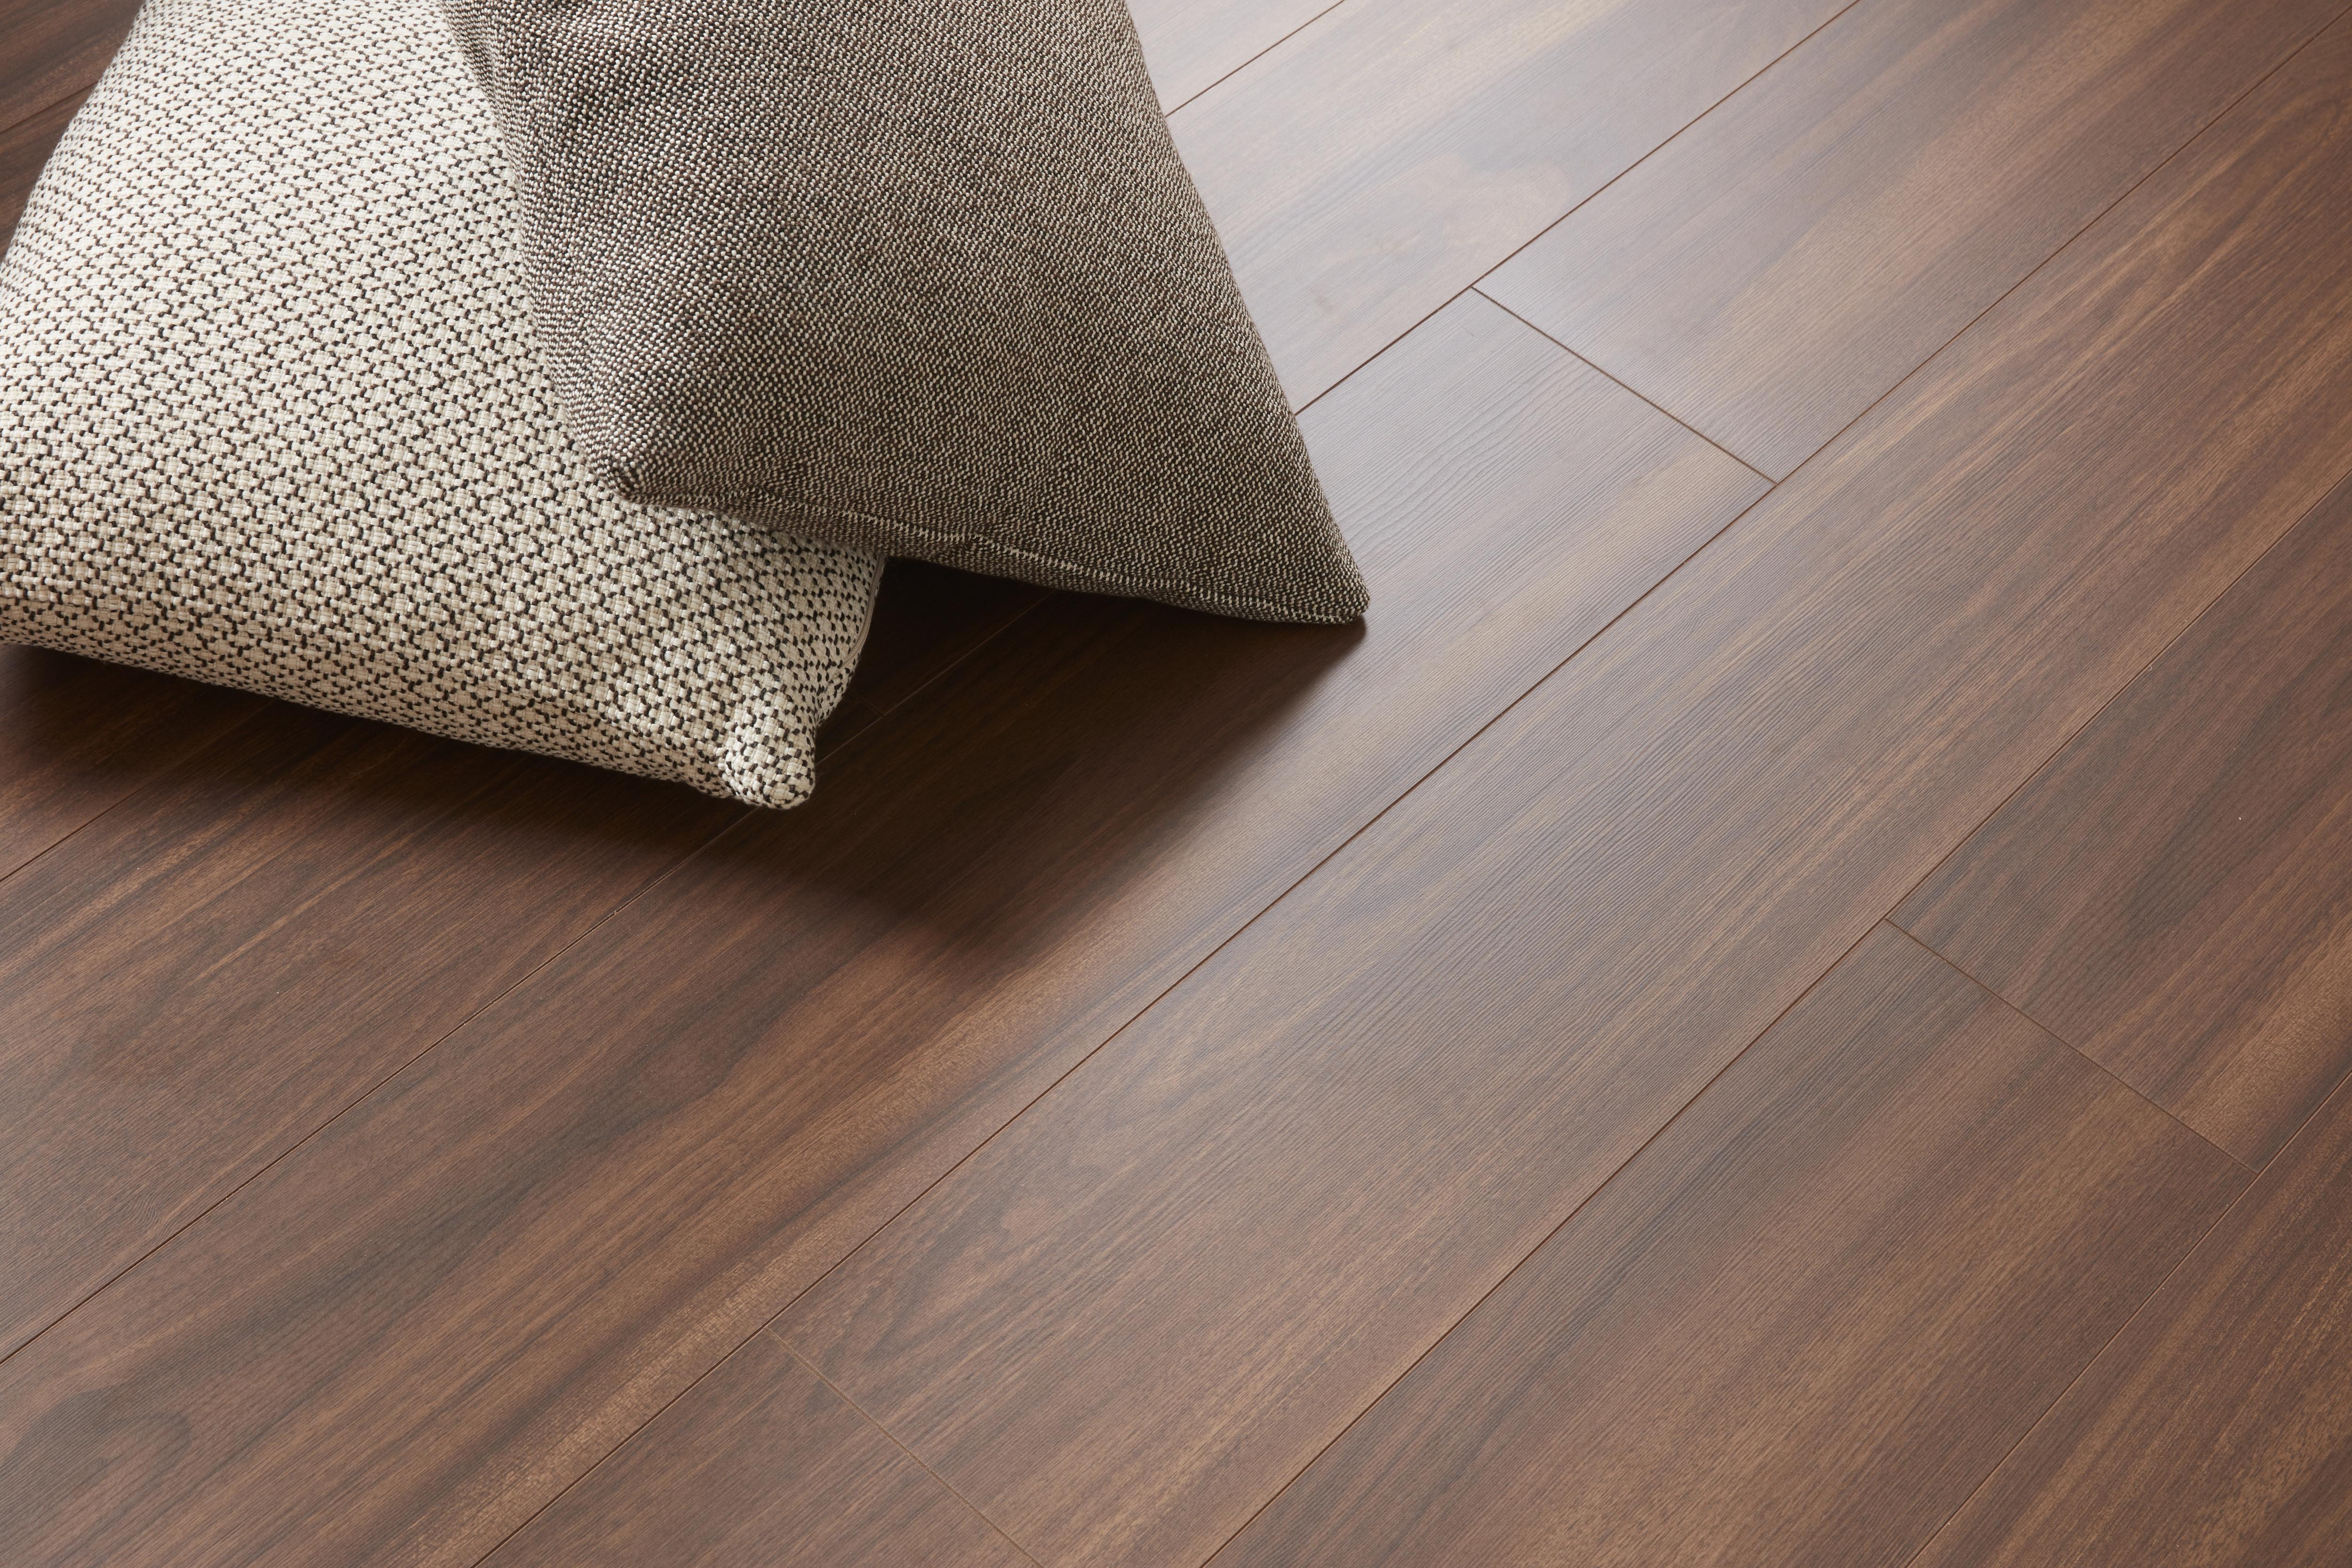 Water Resistant Floors For Moments Of Joy, Pioneer Xl Laminate Flooring